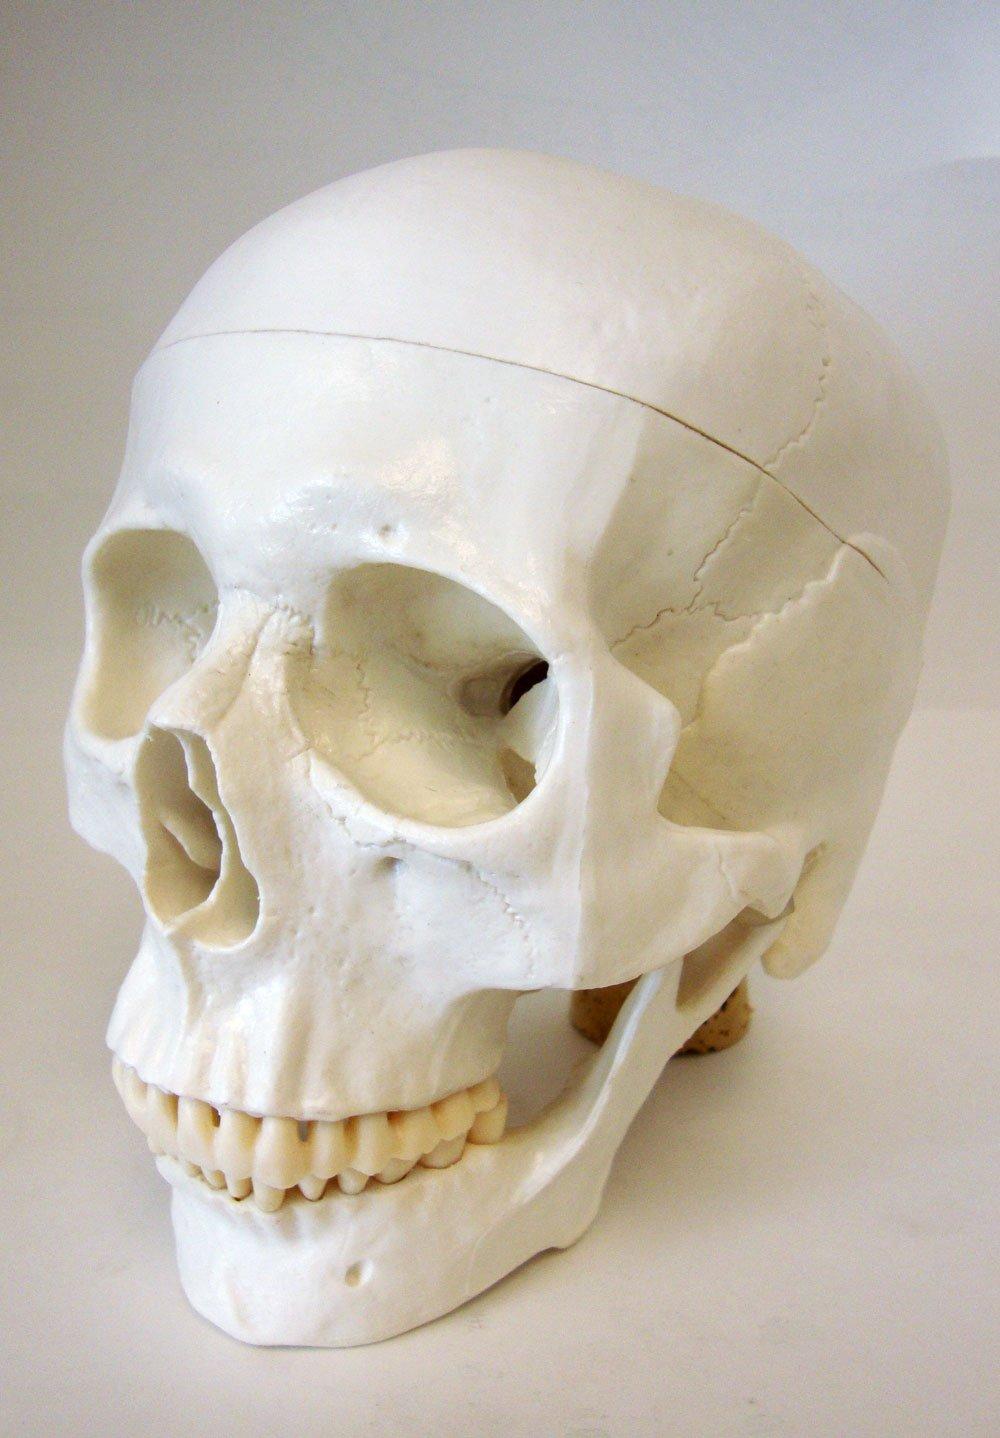 Life Size Model Human Skull Anatomical Model MHB MD11